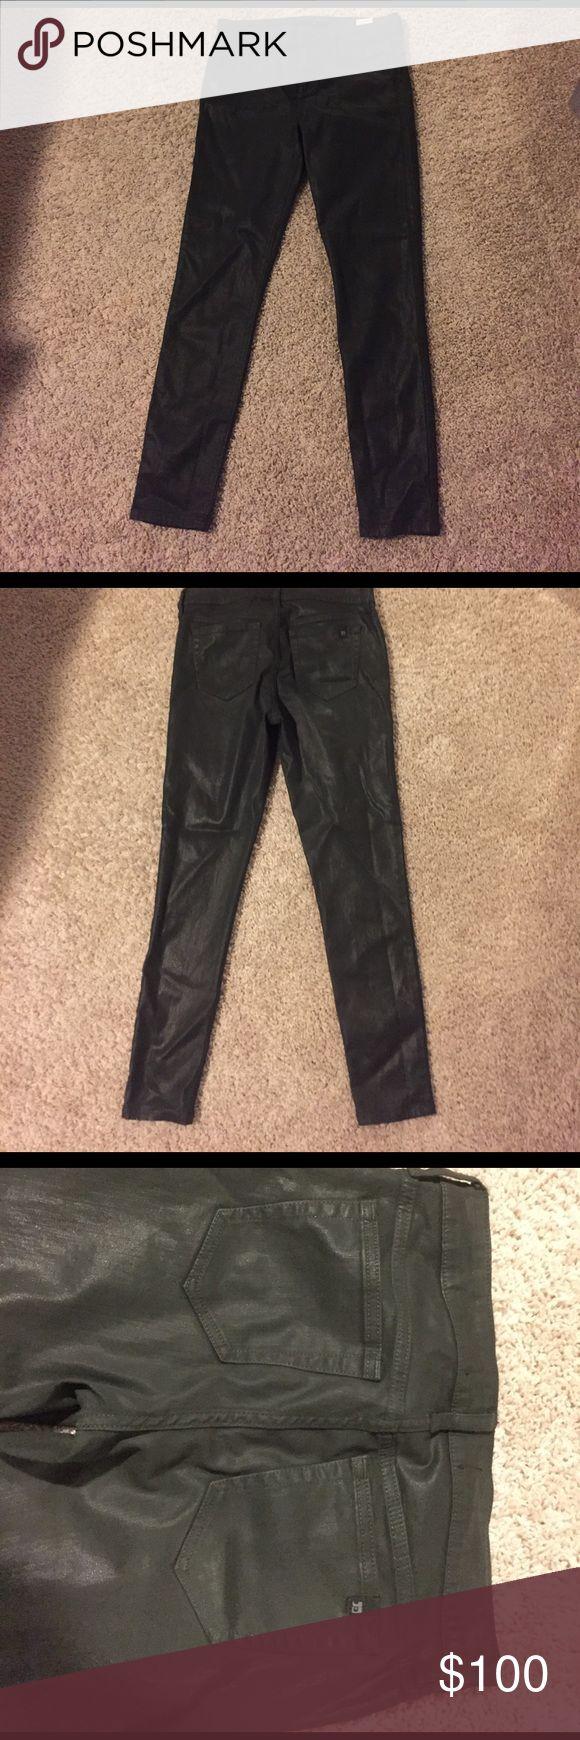 Joe's jeans forest green leather skinny pants Joe's jeans forest green leather skinny pants. Size 28. Like new, only worn once! Joe's Jeans Pants Skinny